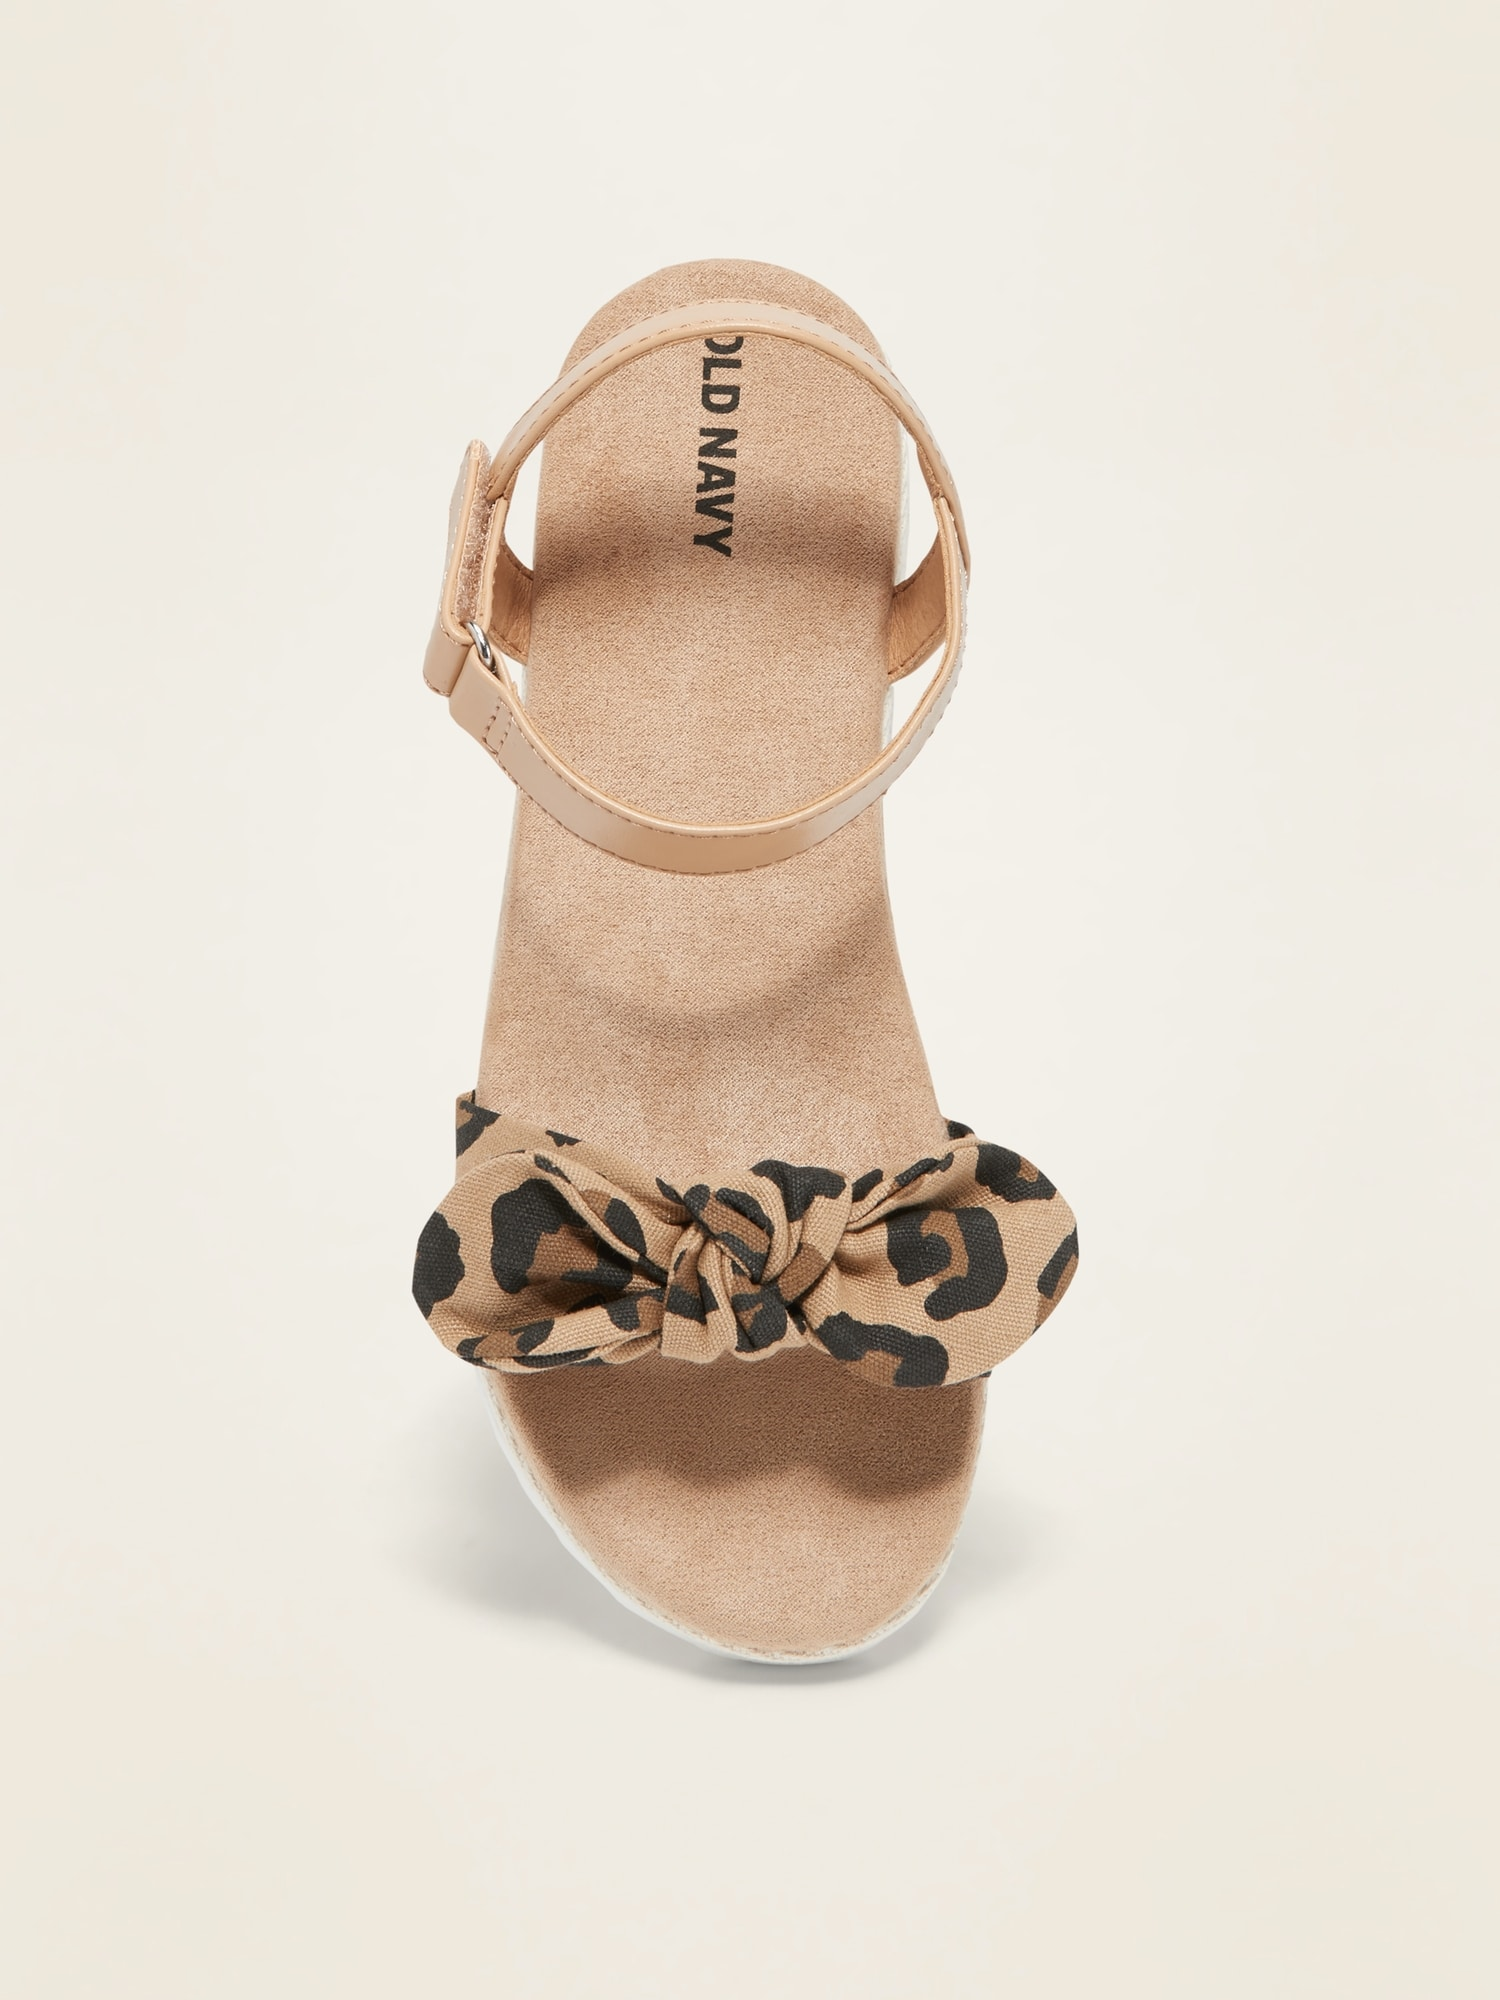 Leopard-Print Bow-Tie Espadrille